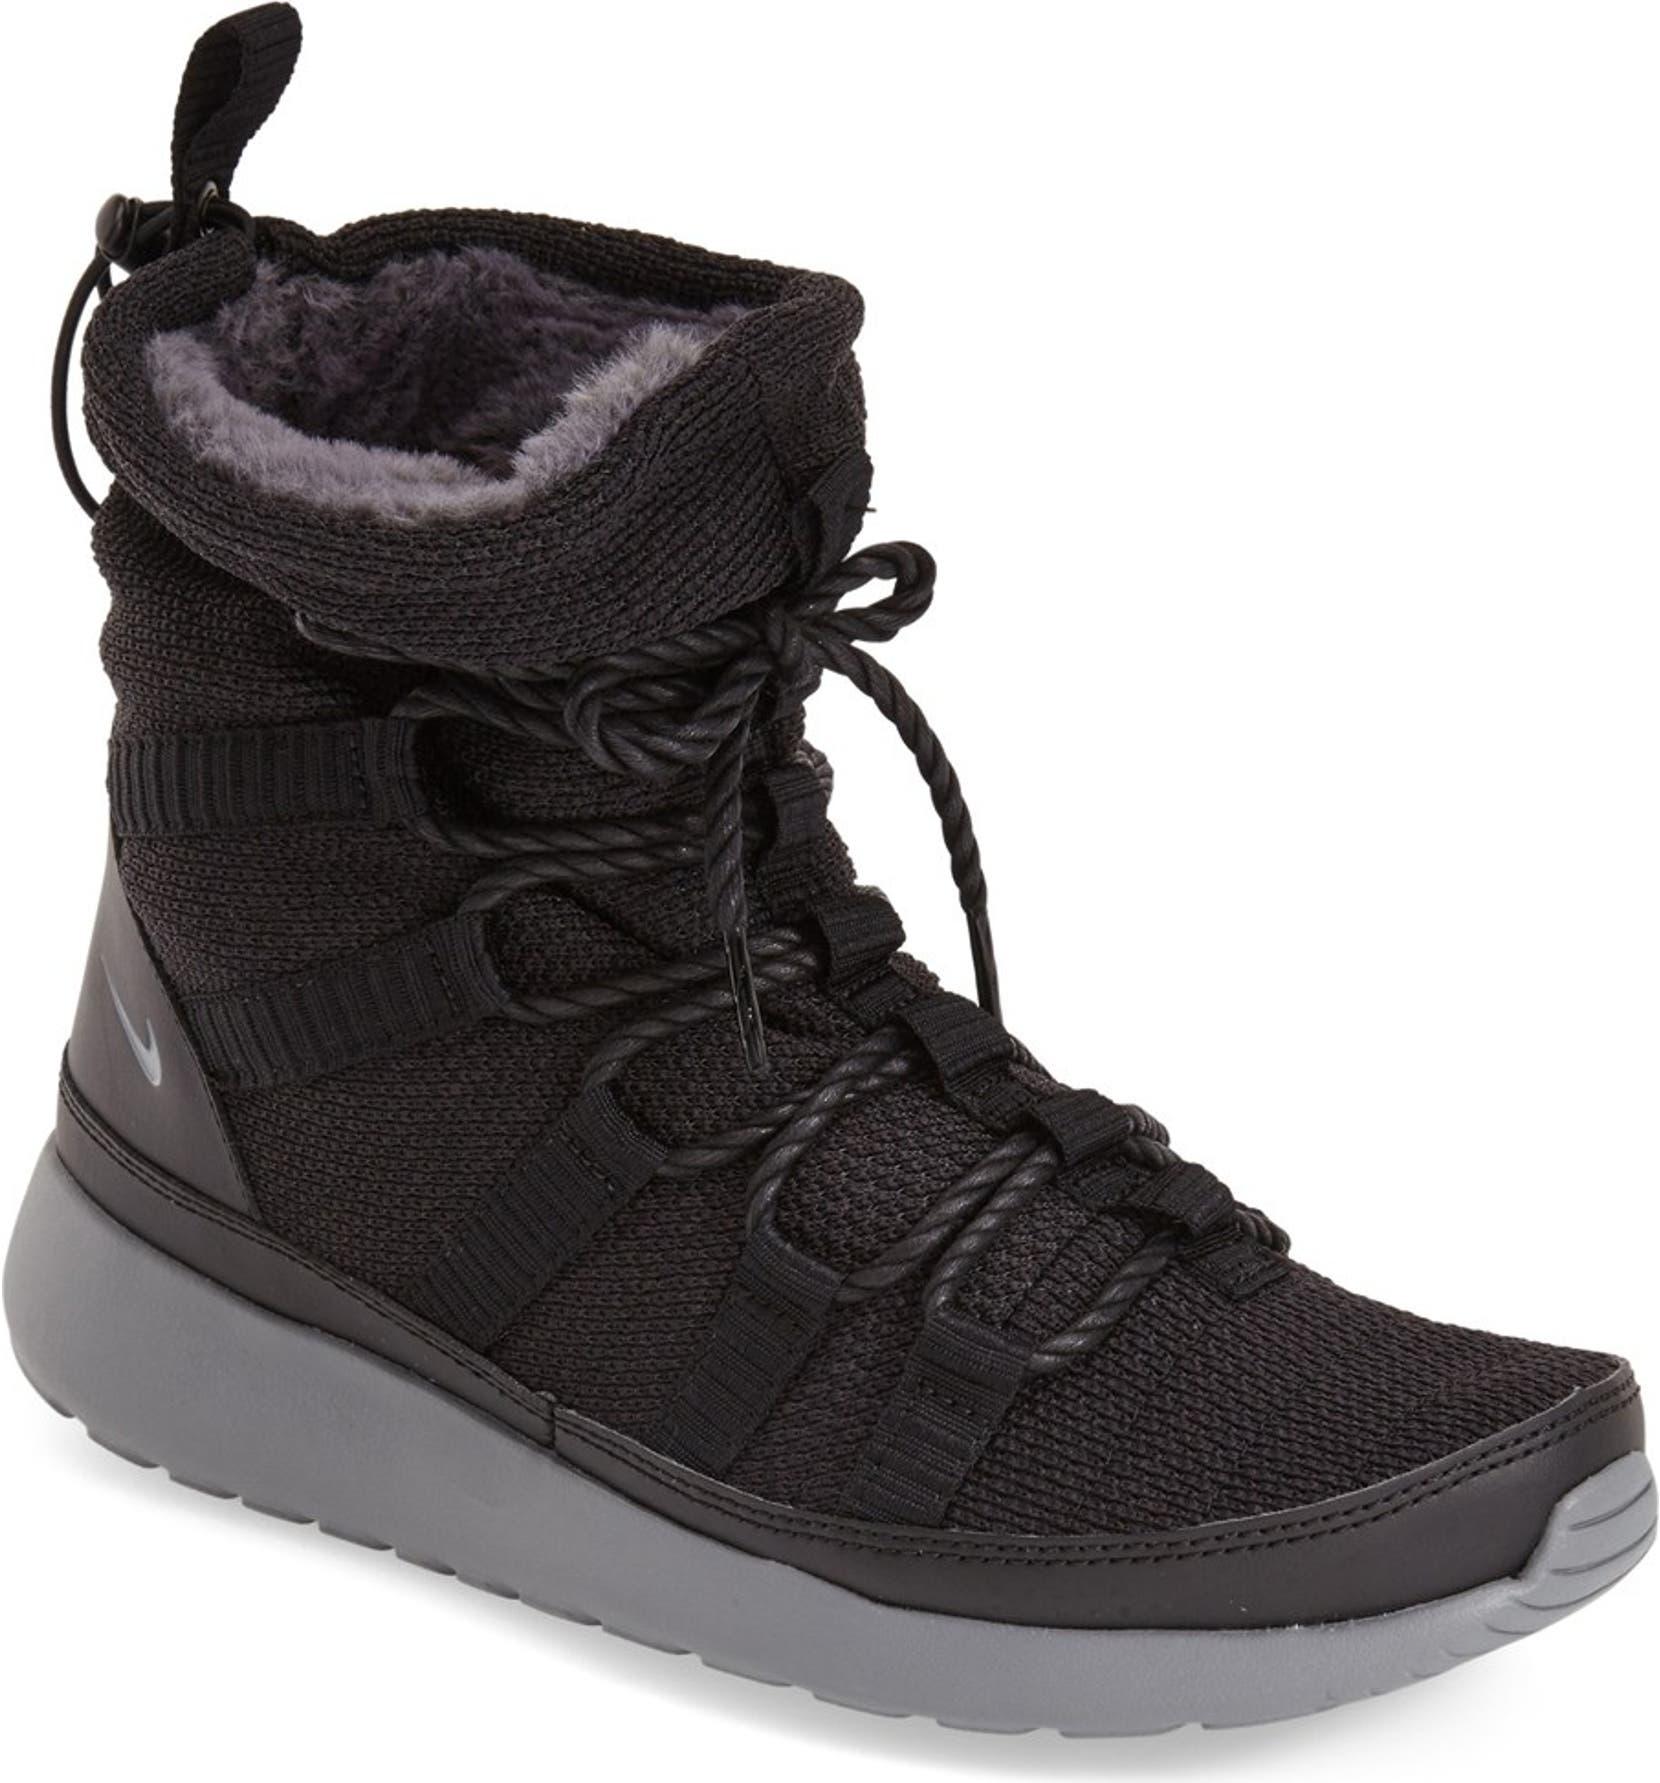 online store f8d89 ebd83 Nike Roshe One Hi Water Resistant Sneaker Boot (Women)  Nord